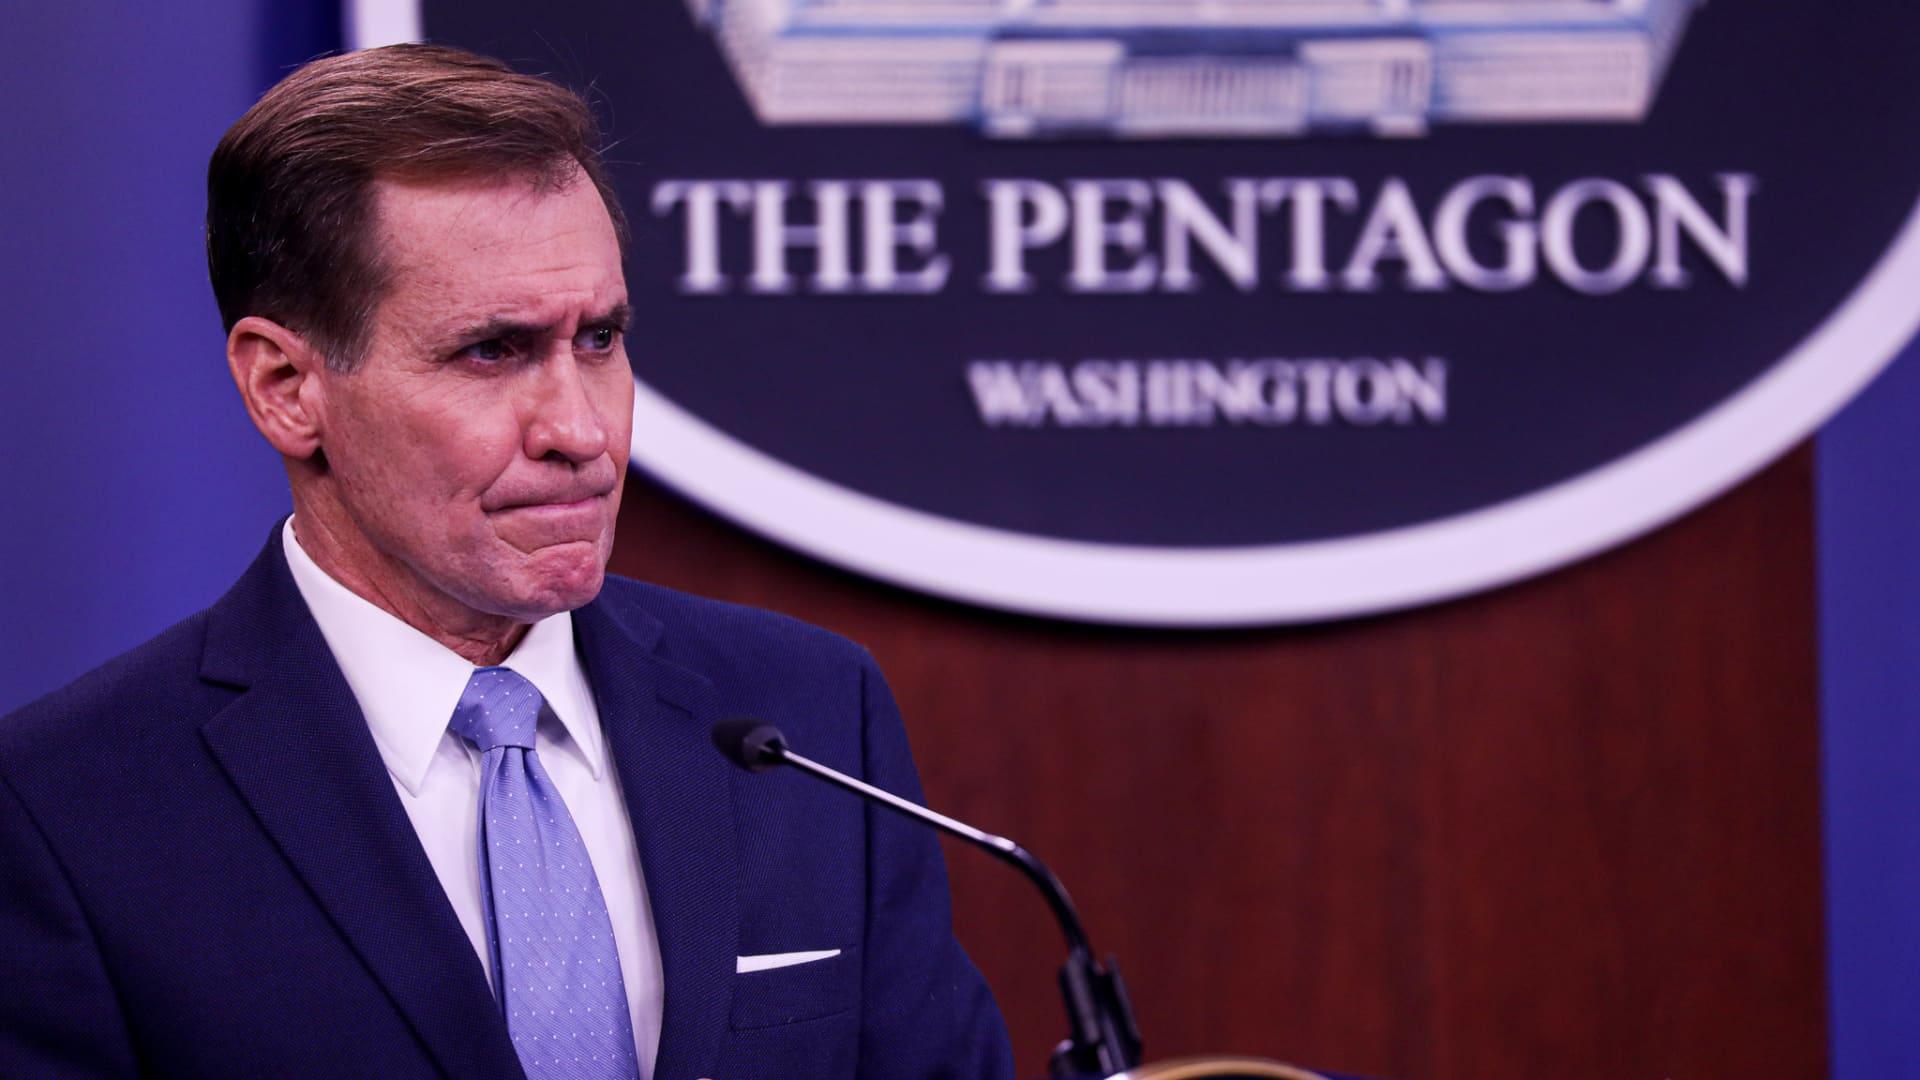 Pentagon Press Secretary John Kirby speaks at press conference at the Pentagon January 28, 2021 in Arlington,Virginia.